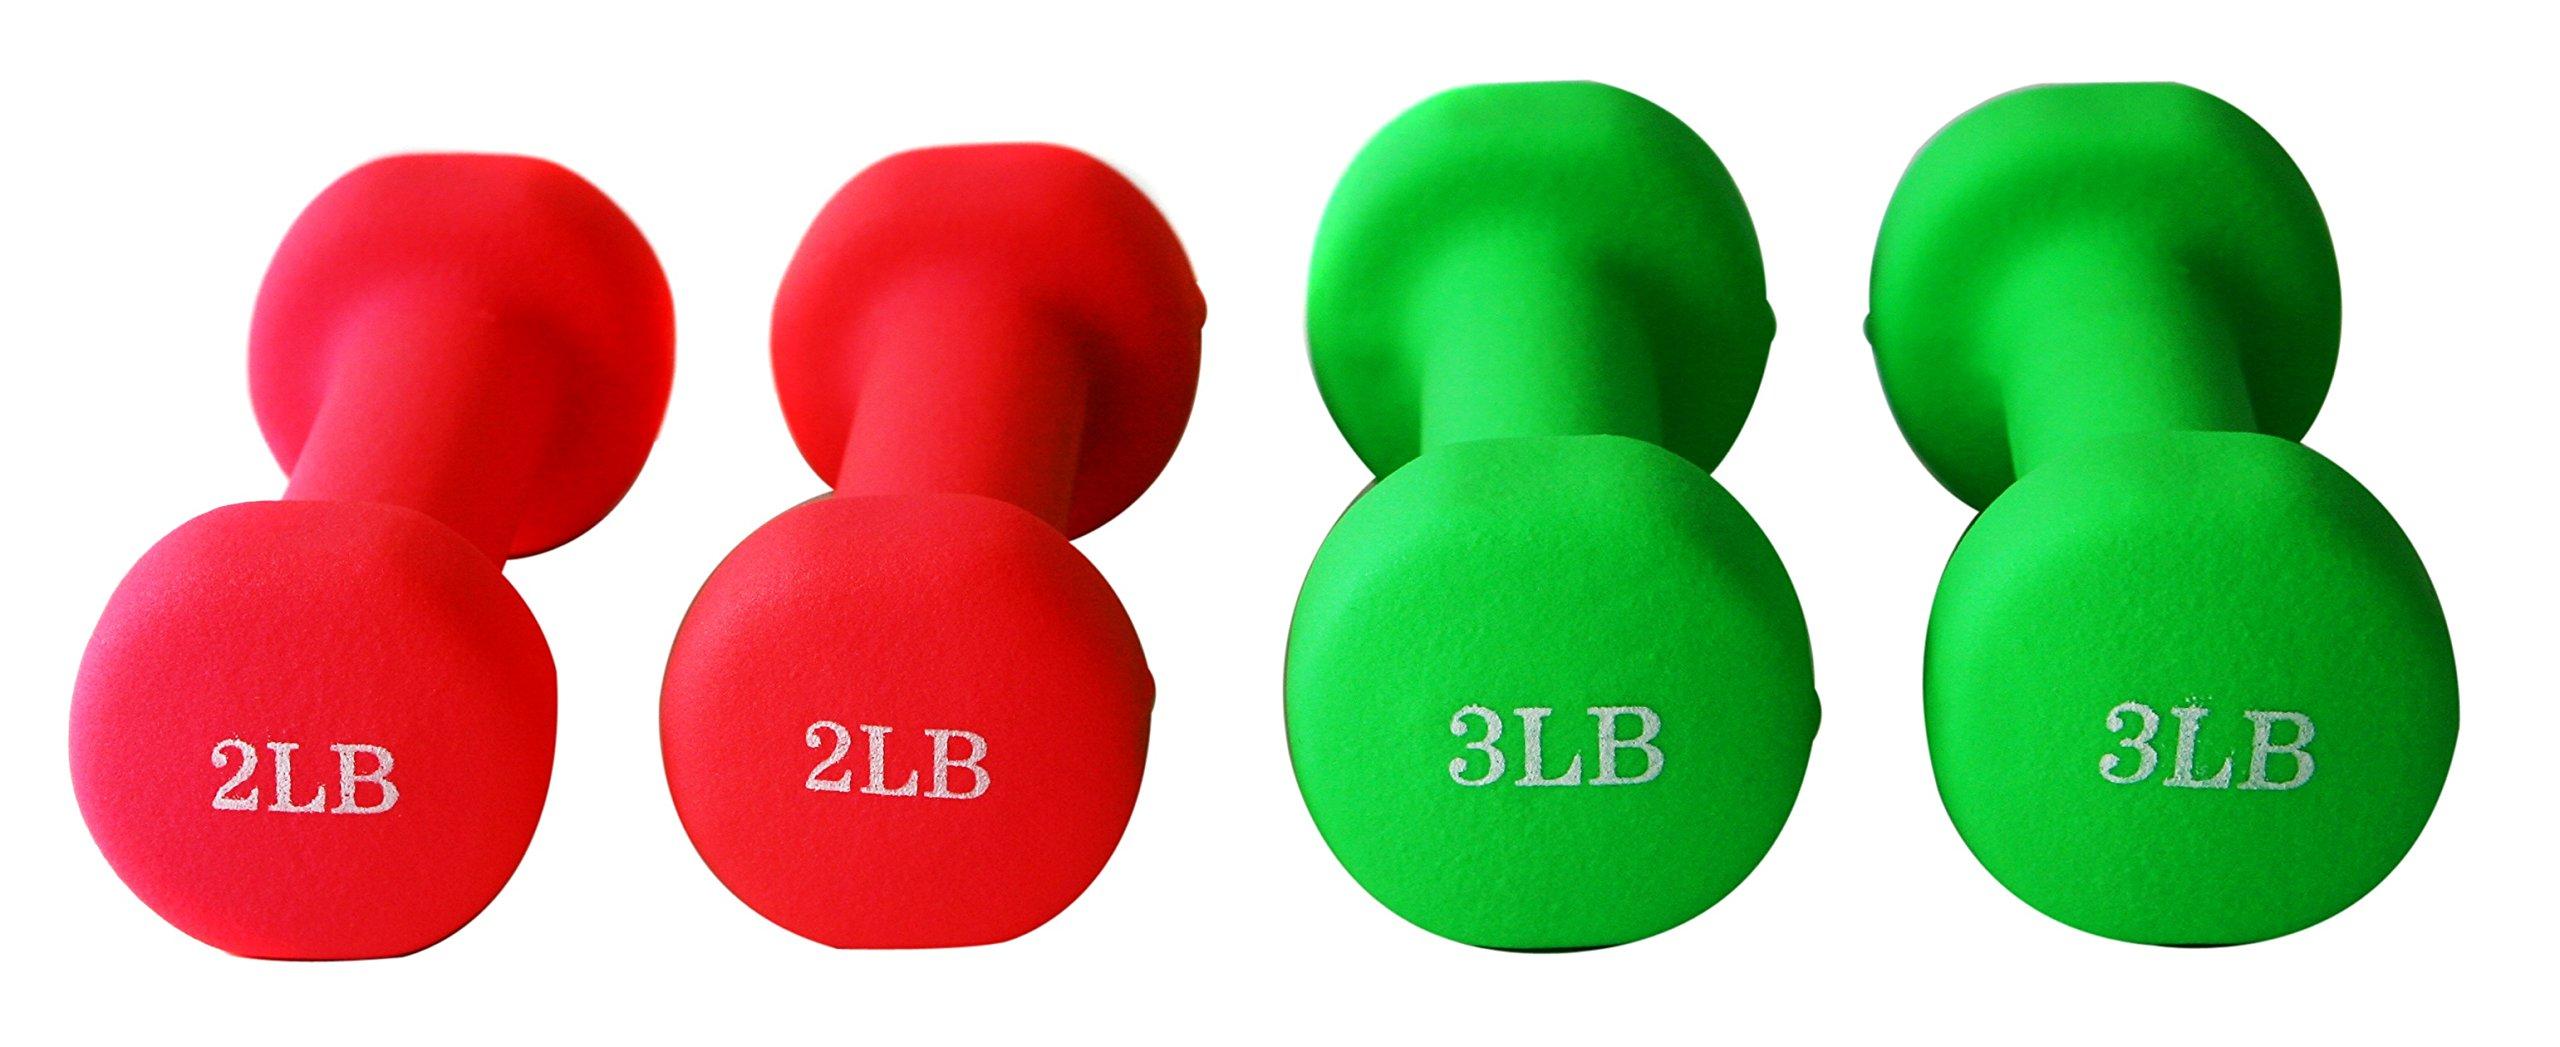 Unipack Neoprene Dumbbells (2+3lbs 2 Pairs)